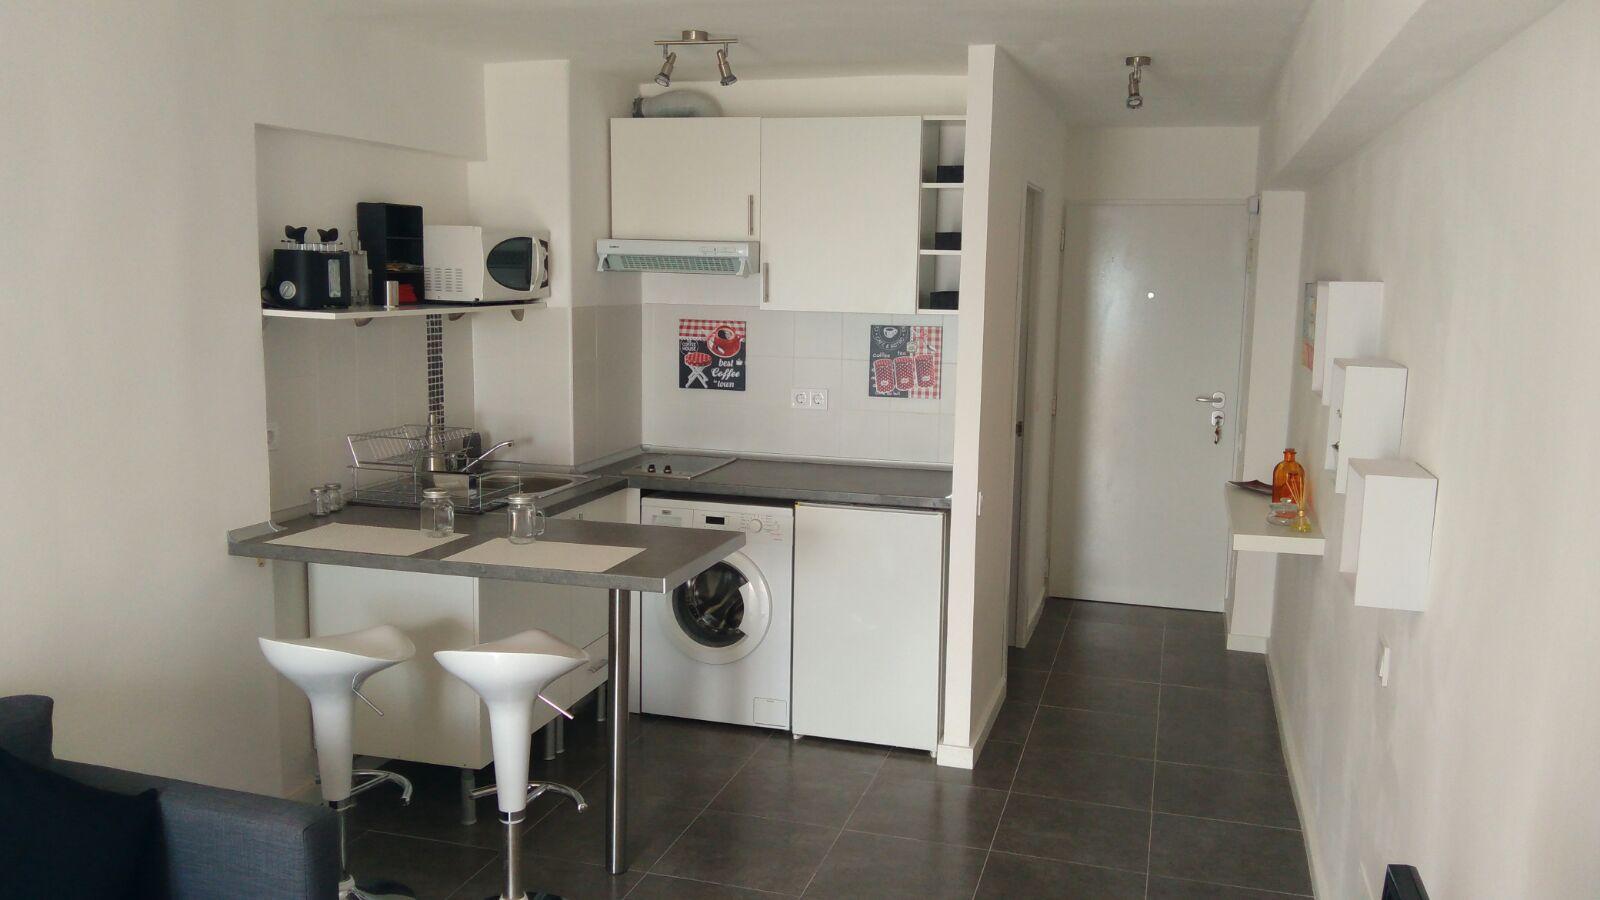 Holiday studio apartment: ACUARIO, Benalmádena. VFT/MA/01986